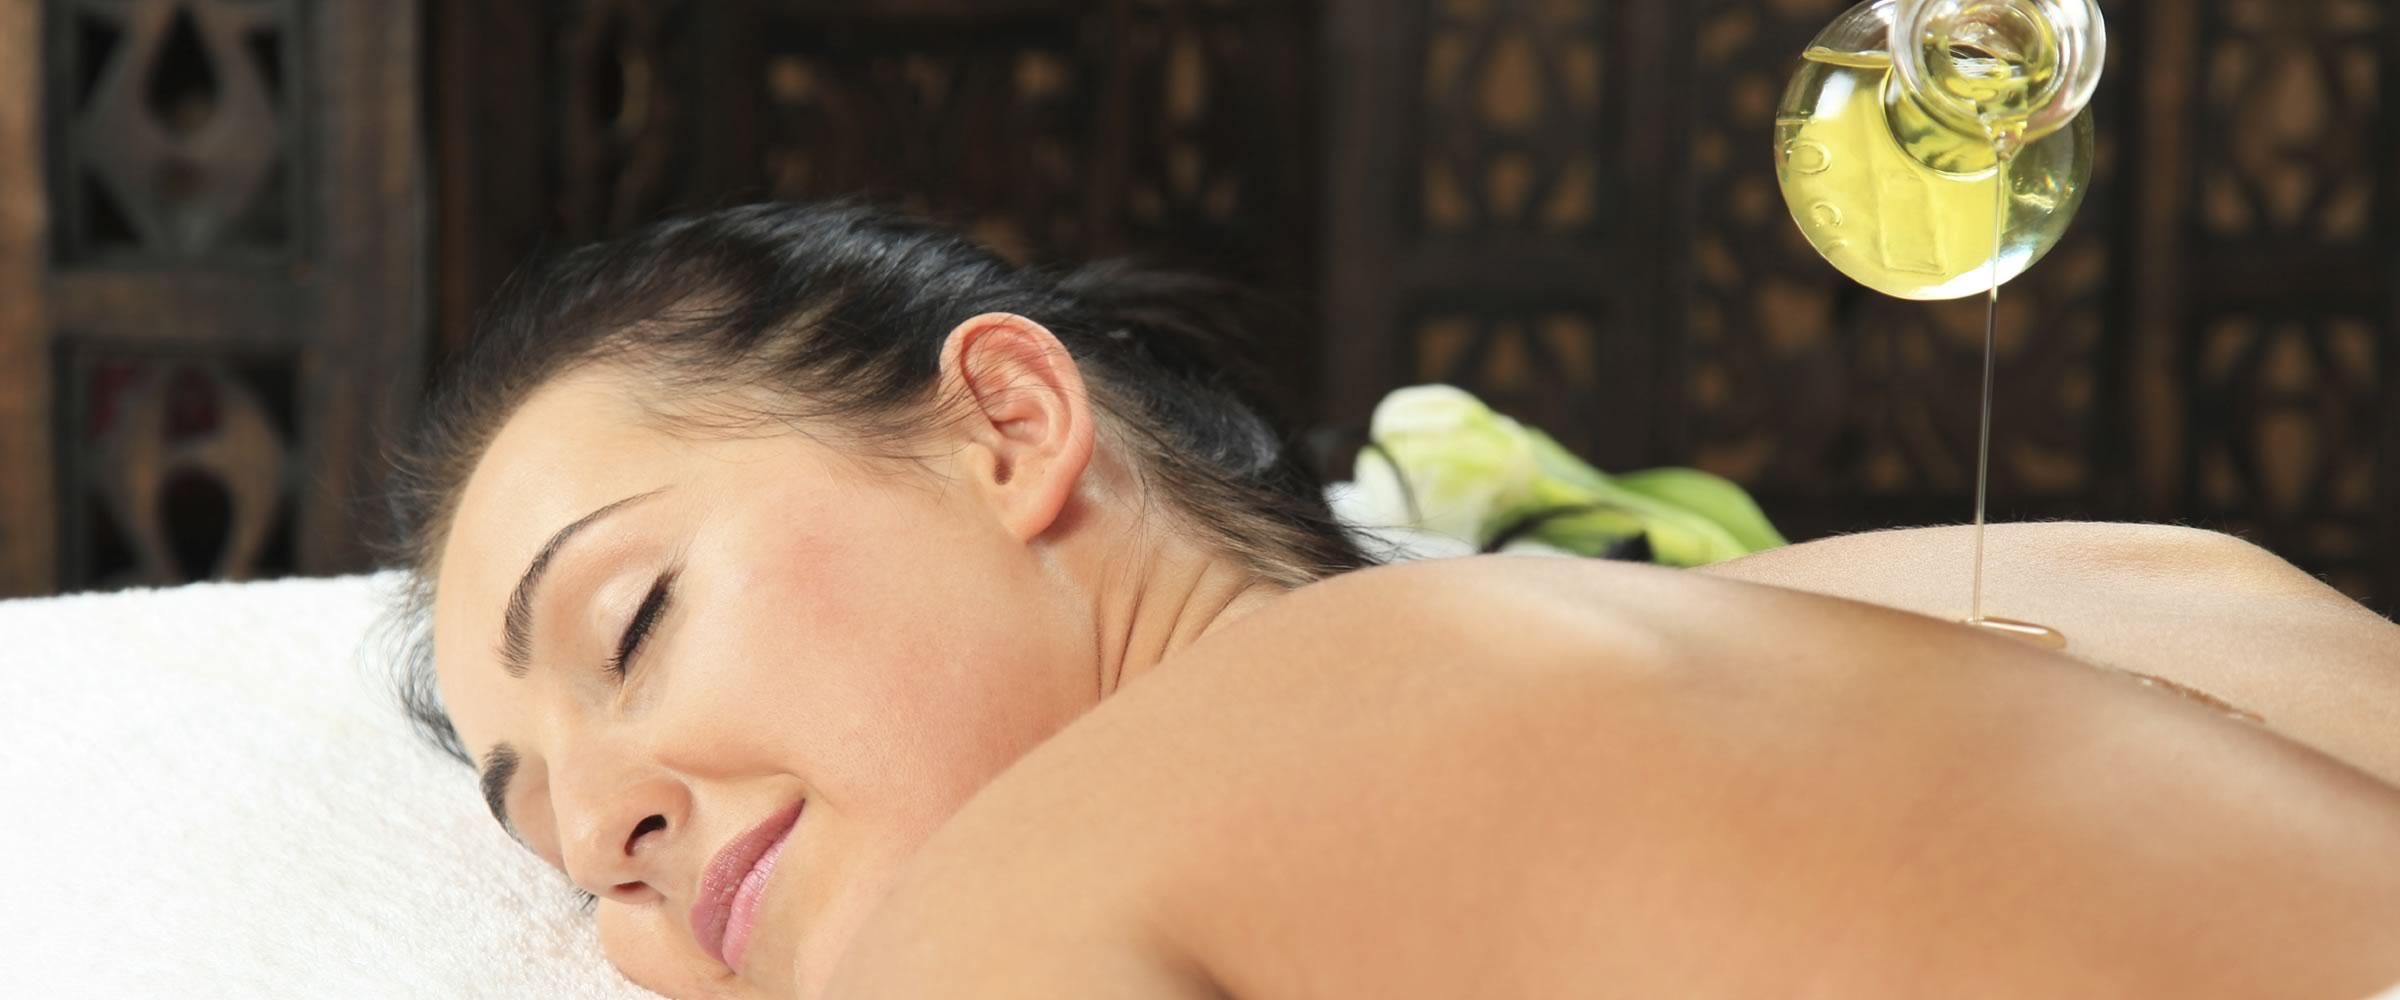 ayurveda tantra massage